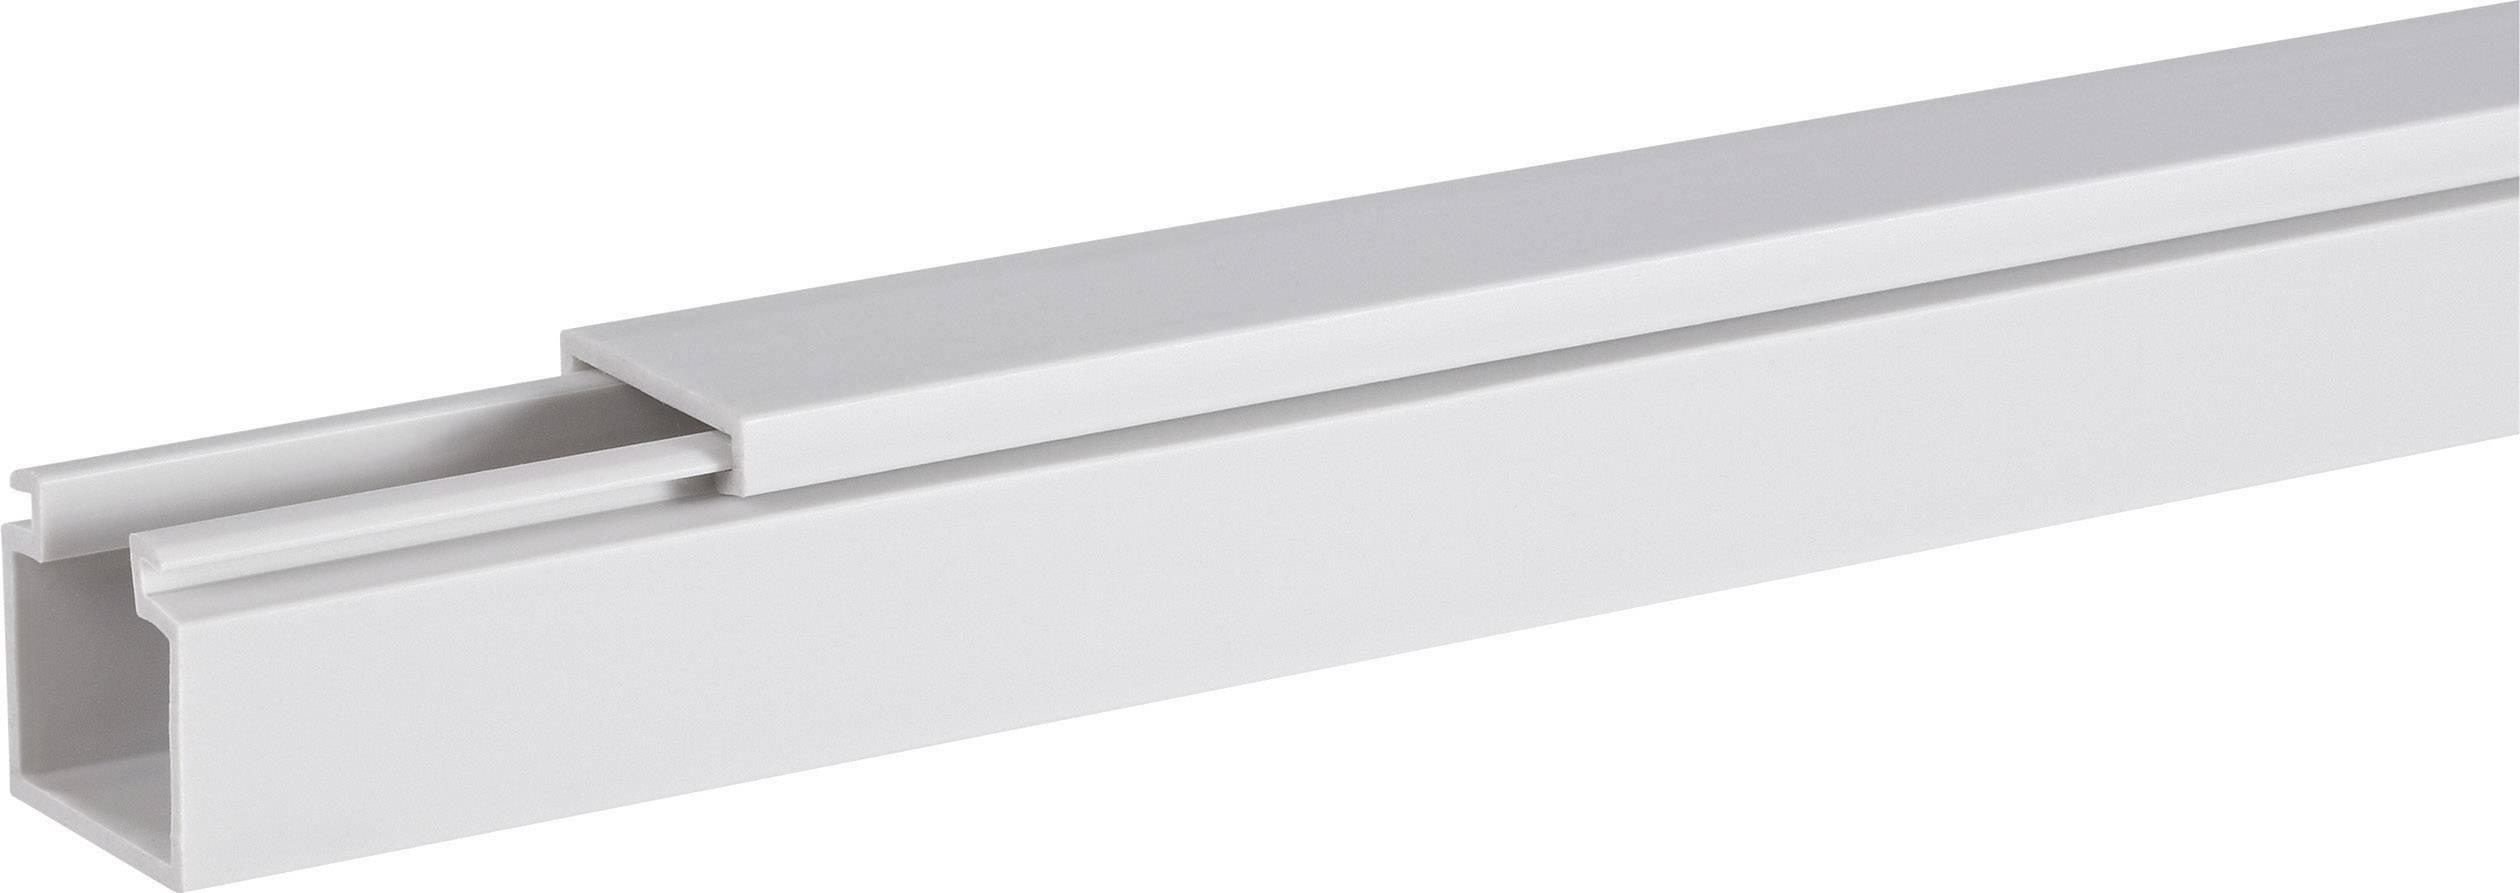 Káblová lišta Hager LF1501507035, 1 ks, svetlo sivá